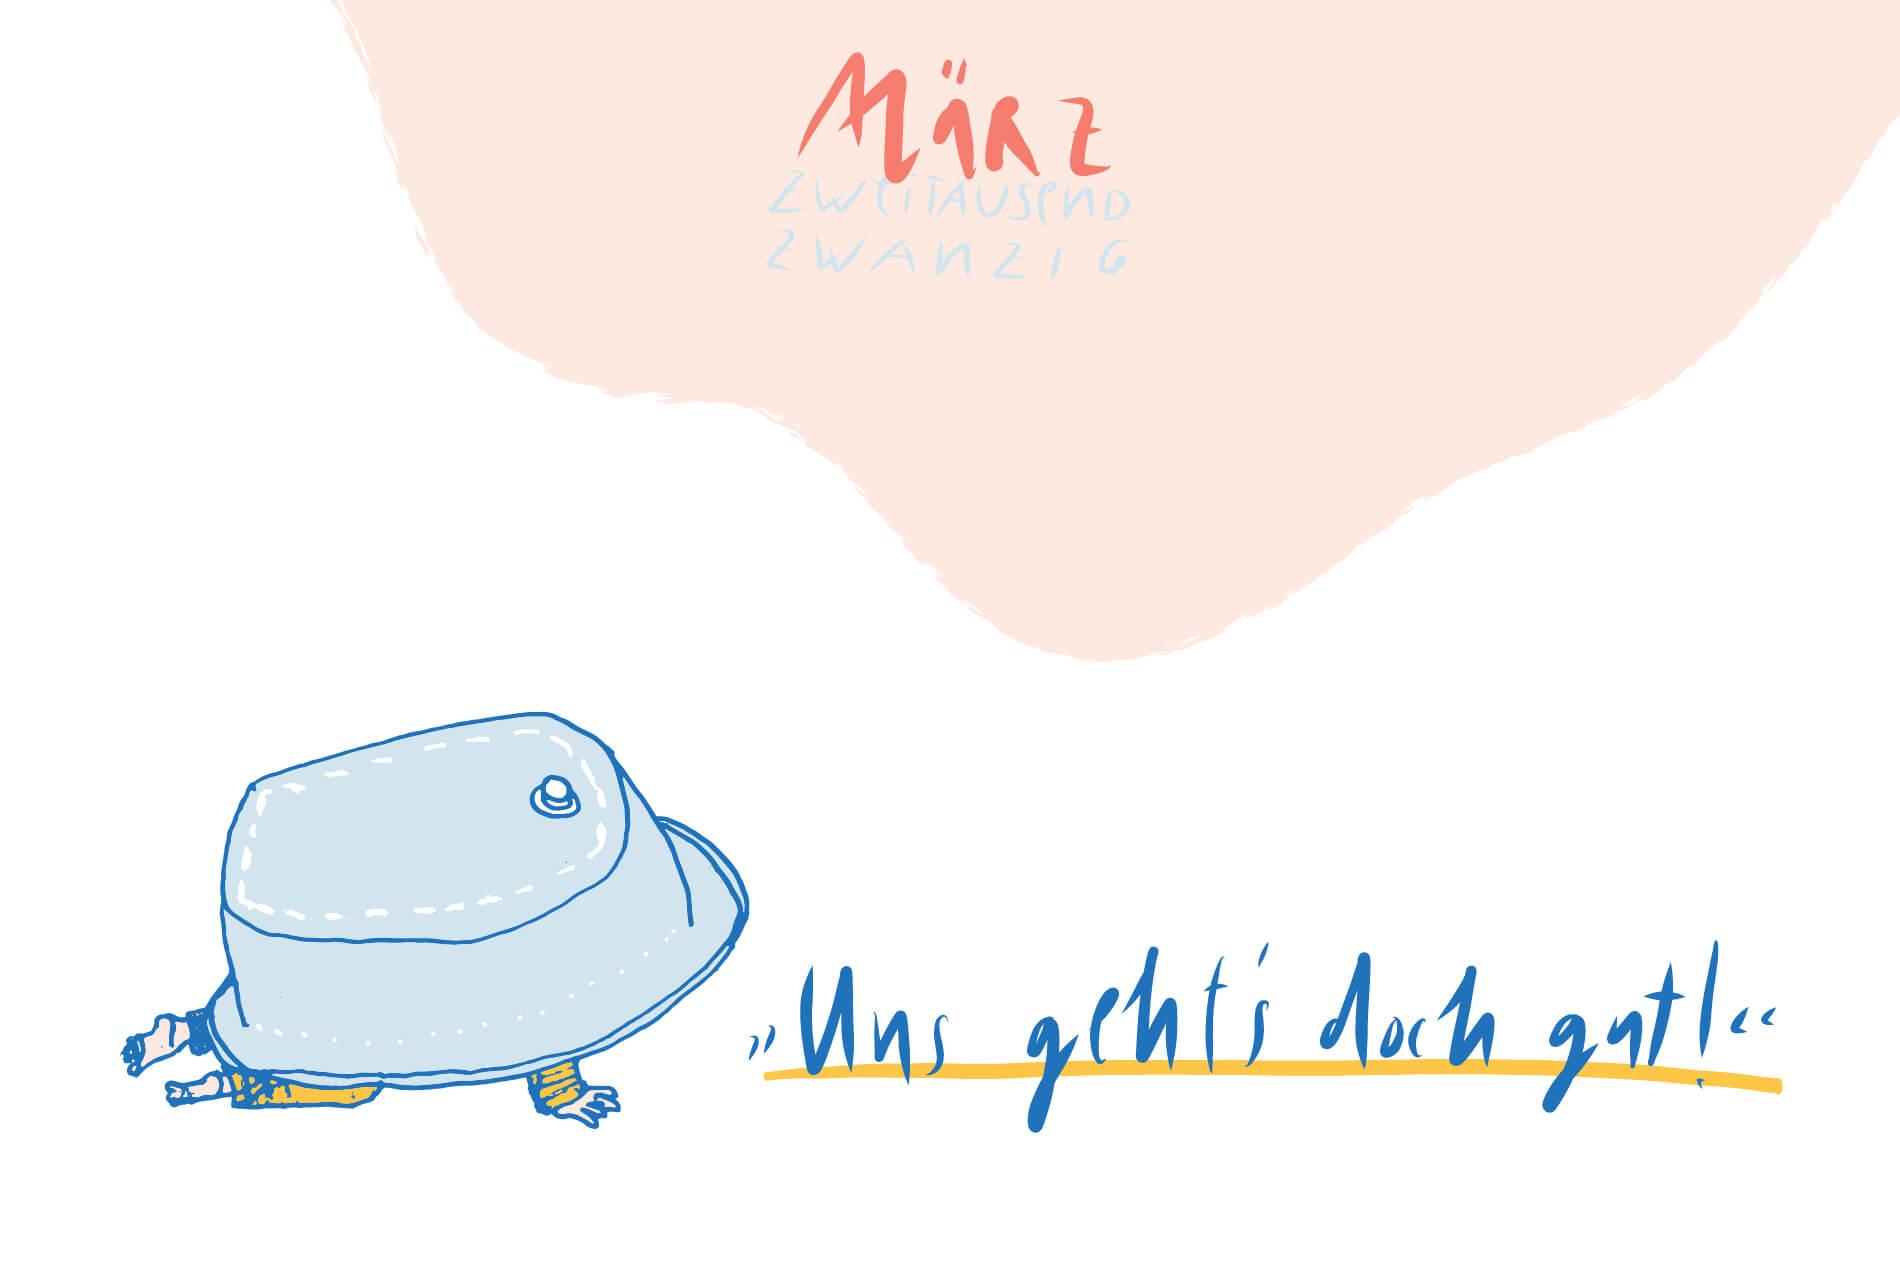 Matrosenhunde Illustration Zeichnung Illustratorin Text Prosa Monatskalender März uns gehts doch gut